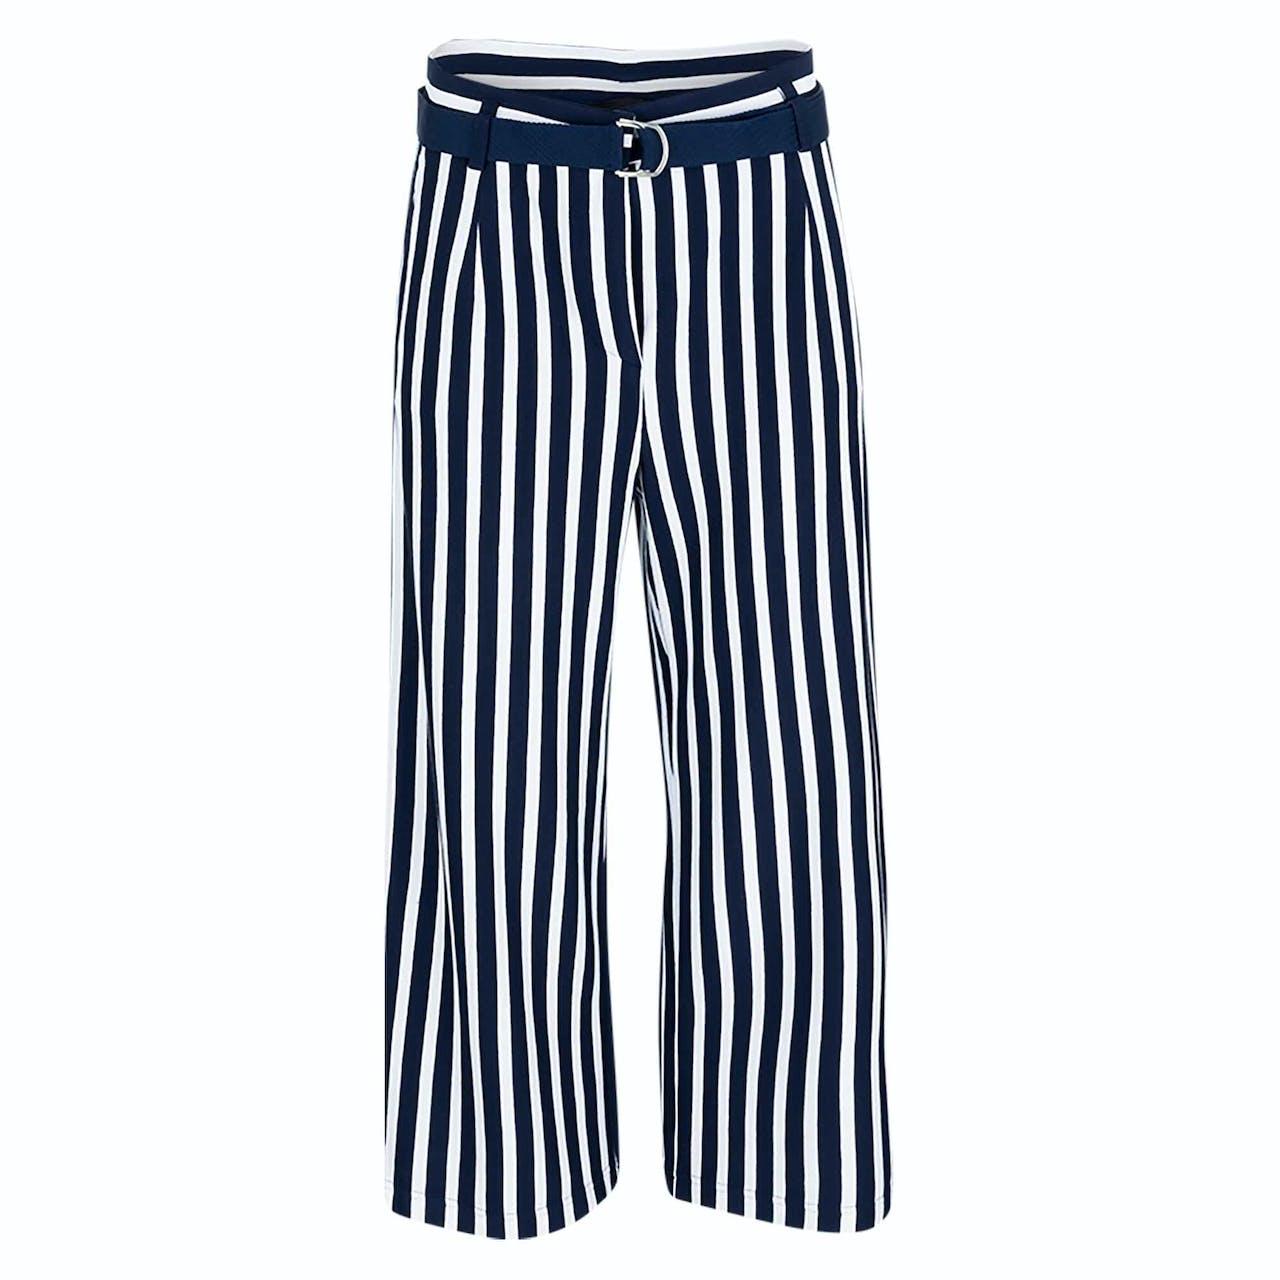 Culotte - Loose Fit - Stripes